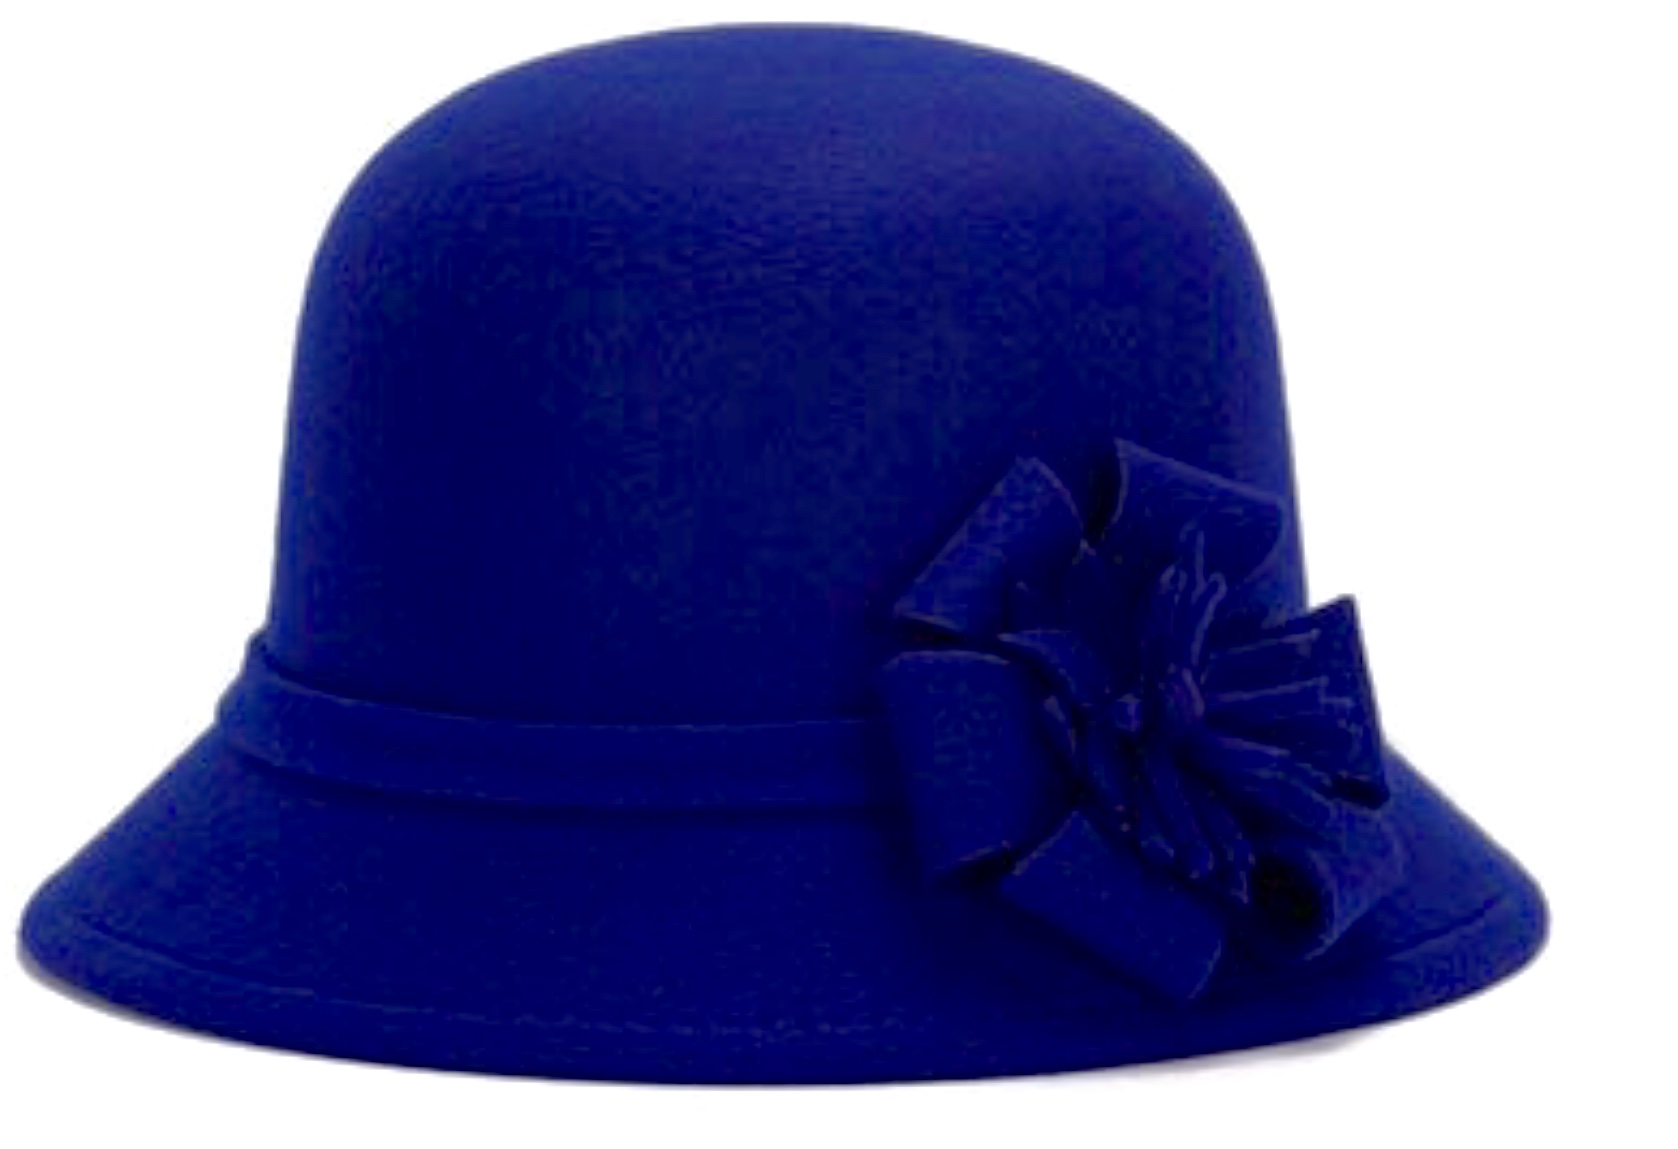 8c5931a3c774f4 LV L Blue Dress Hat · LAVISHLOCKETT Boutique · Online Store Powered ...